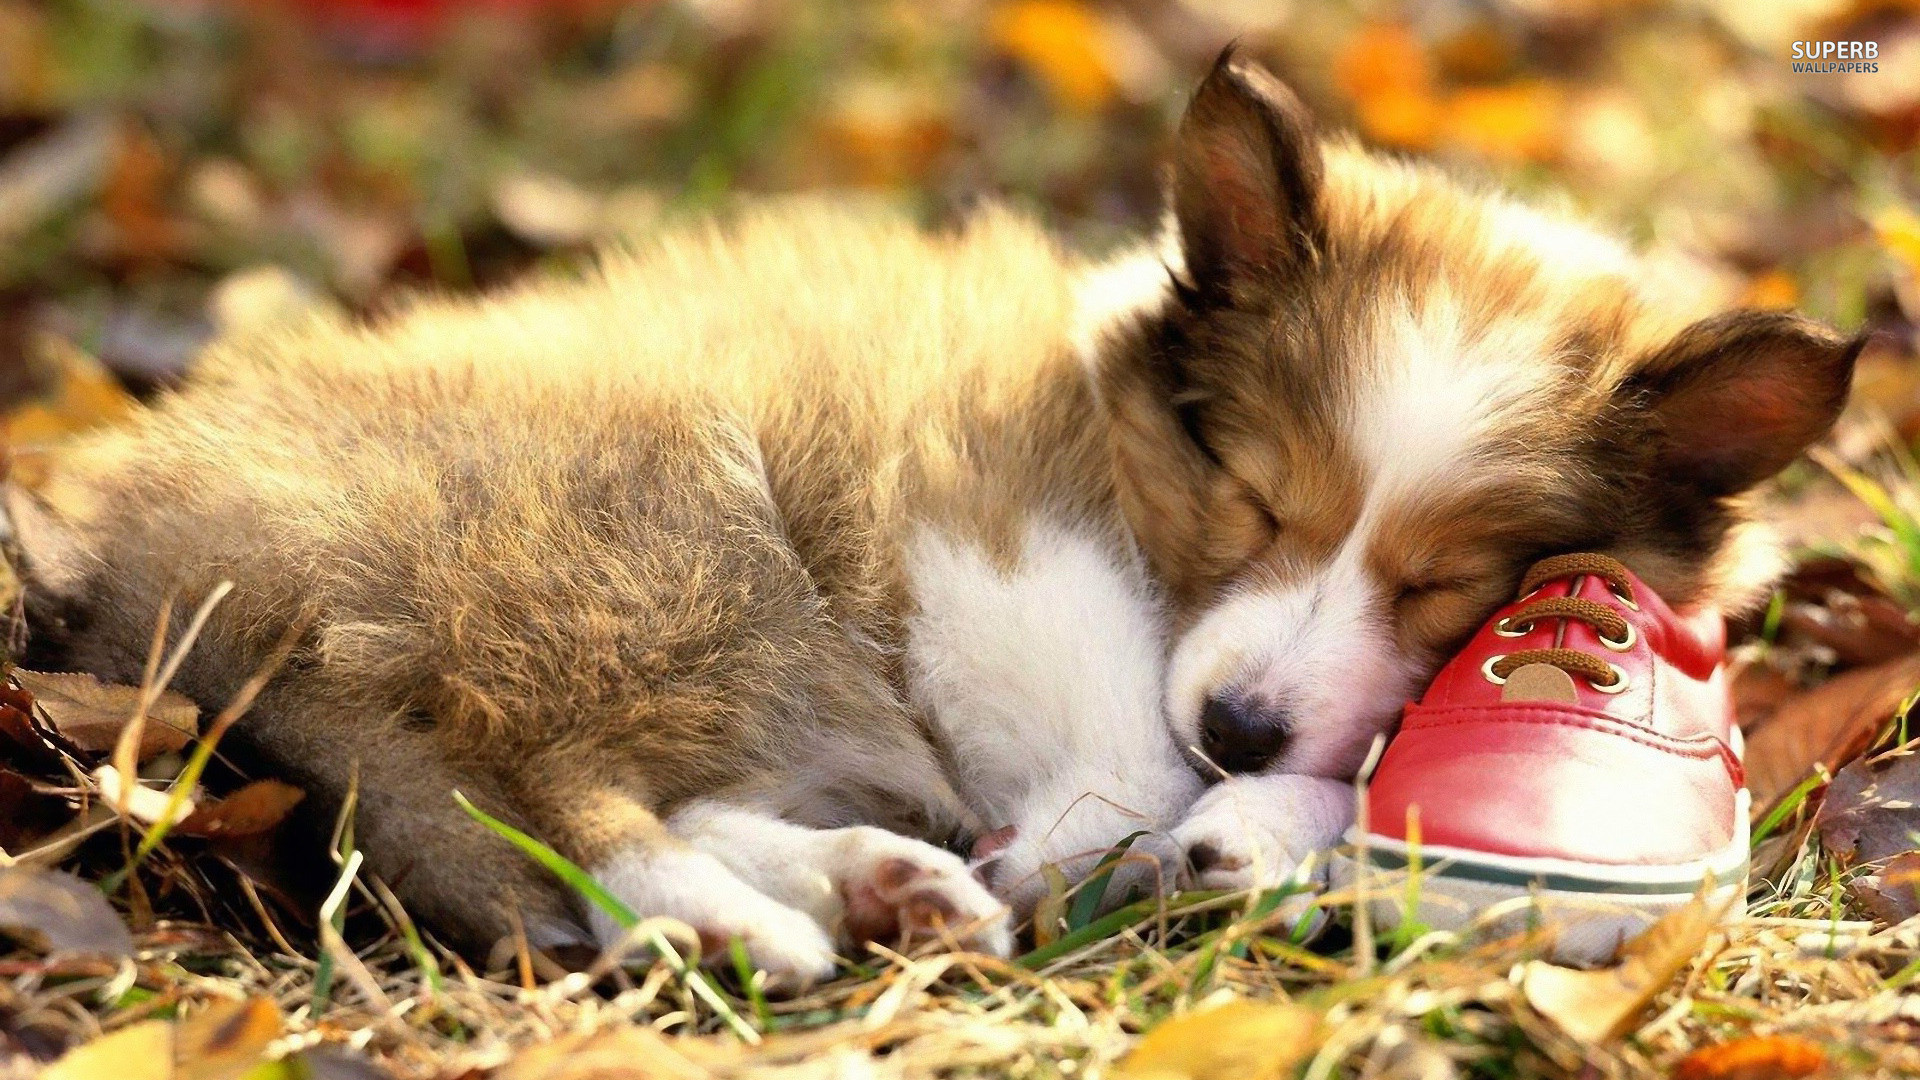 Cute Welsh Corgi Puppy Wallpaper Desktop #14a px 767.38 KB Animal  1600×900 black